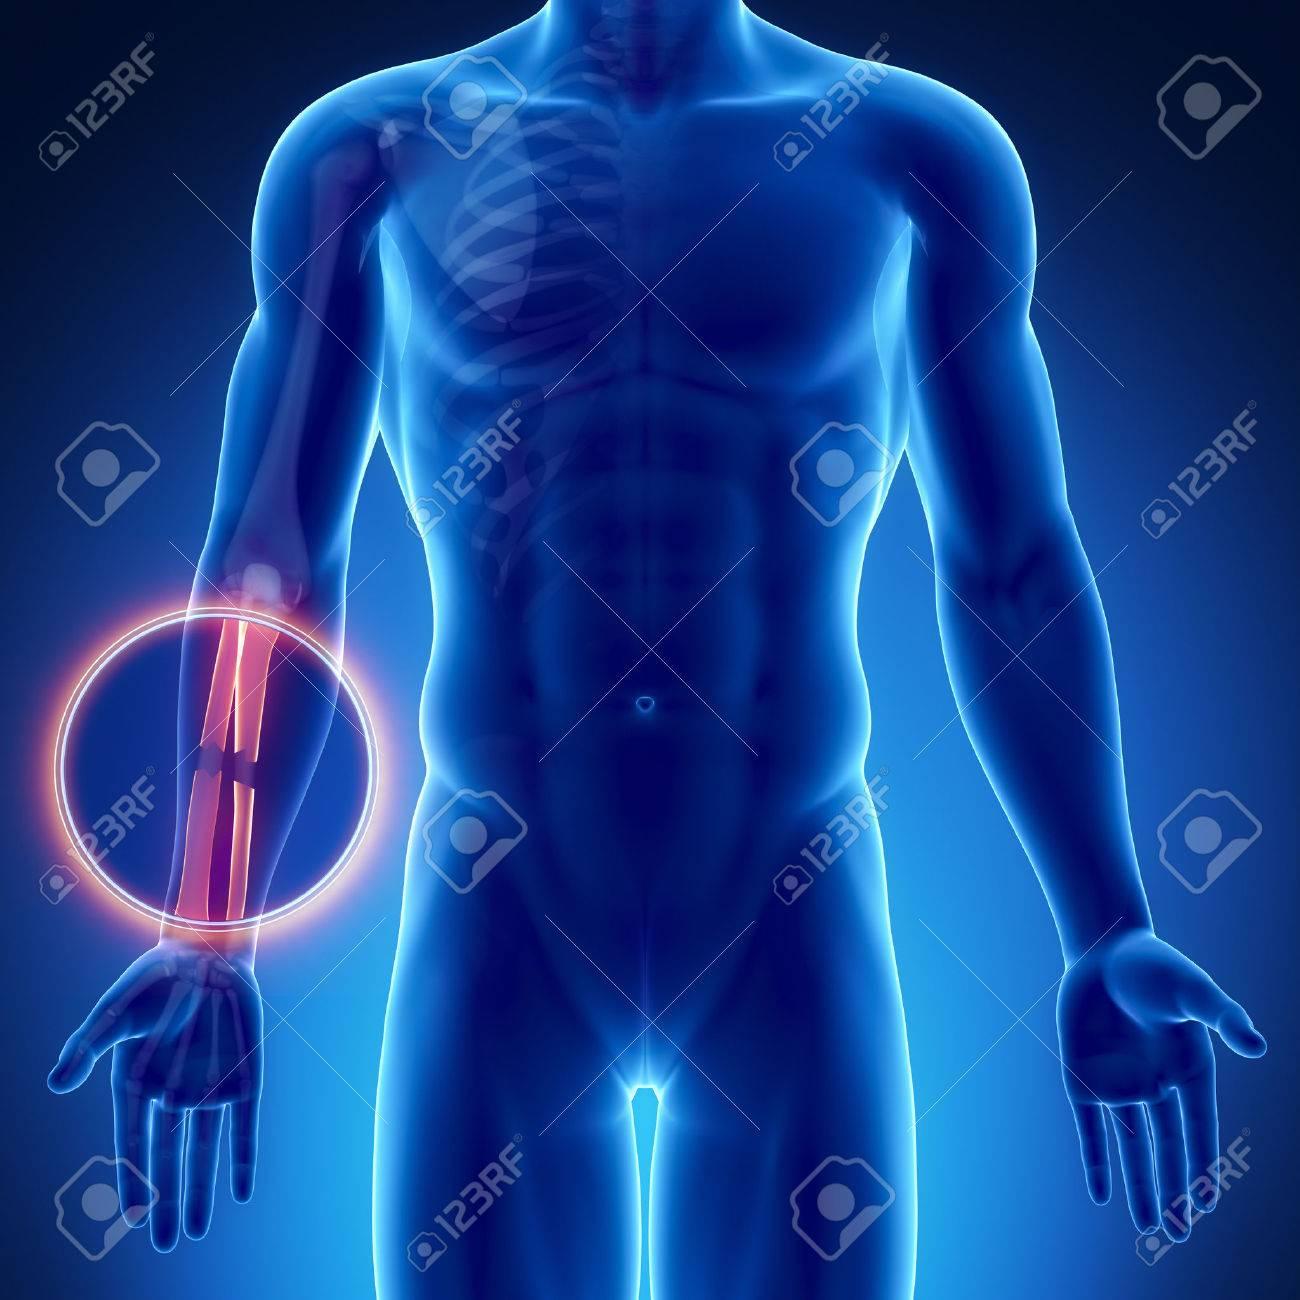 Male Bone Anatomy Radius Ulna Broken Stock Photo, Picture And ...